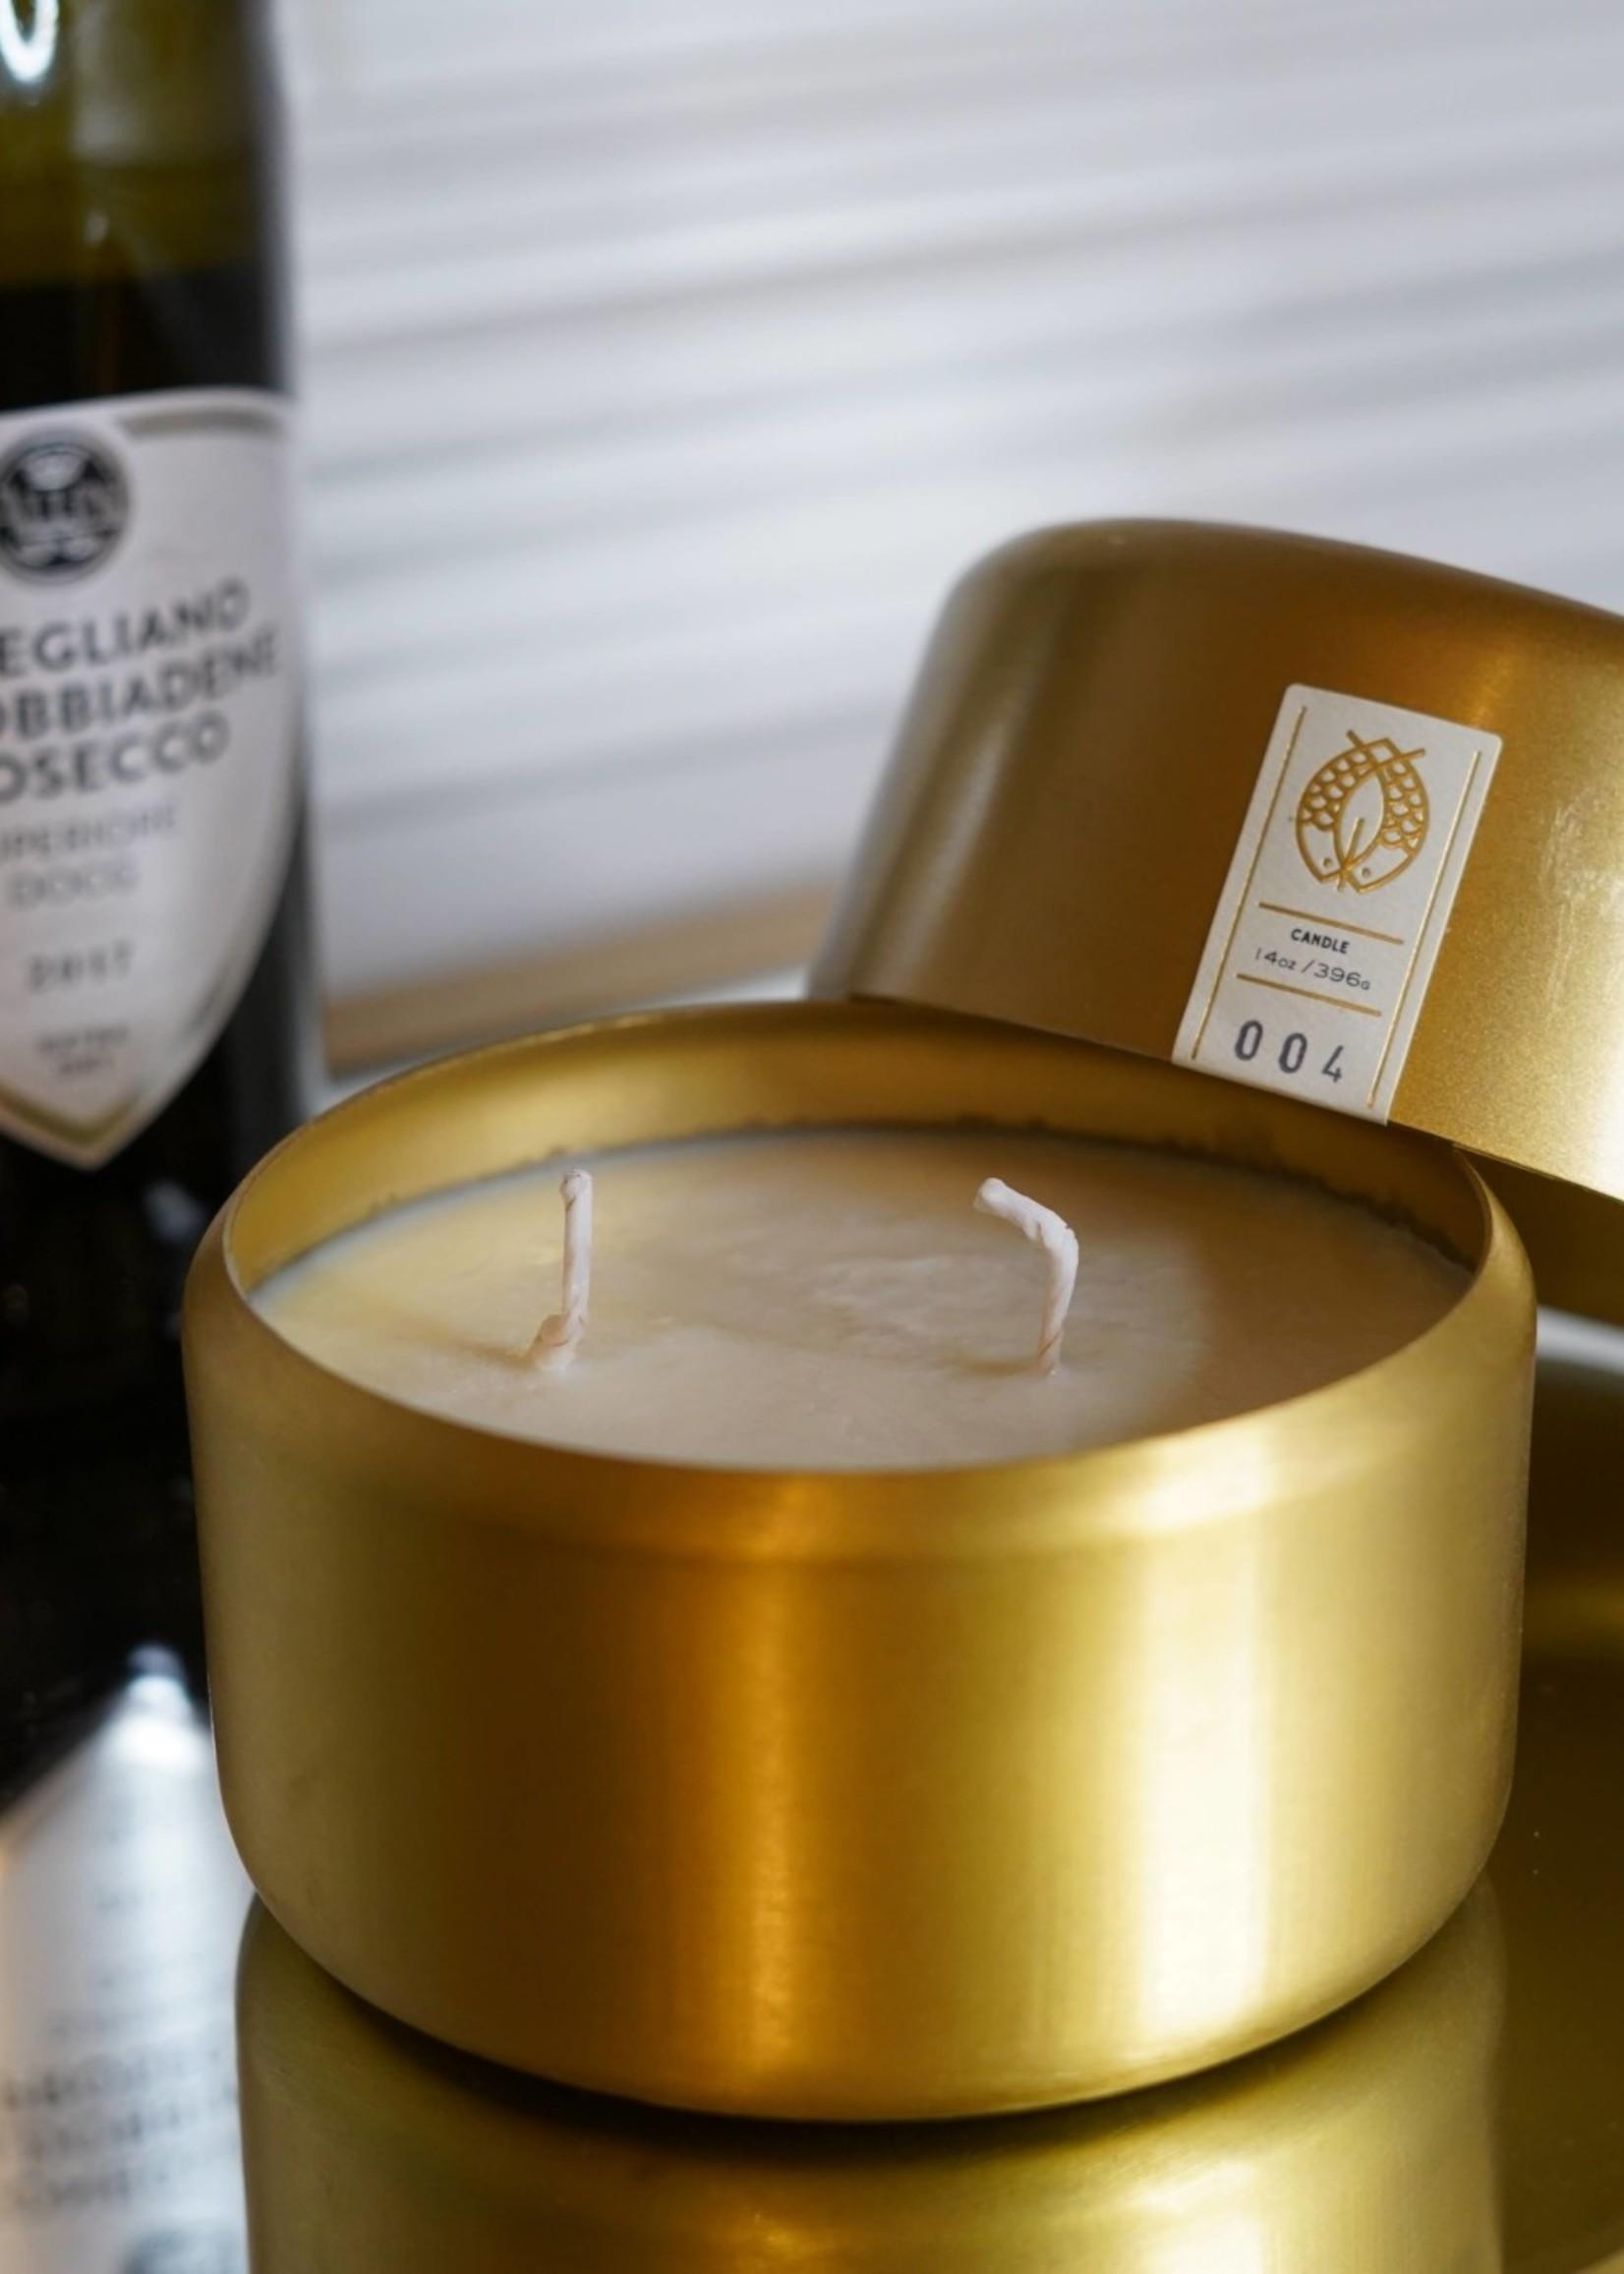 Candlefish No. 88 Molded Metal 14 oz Candle